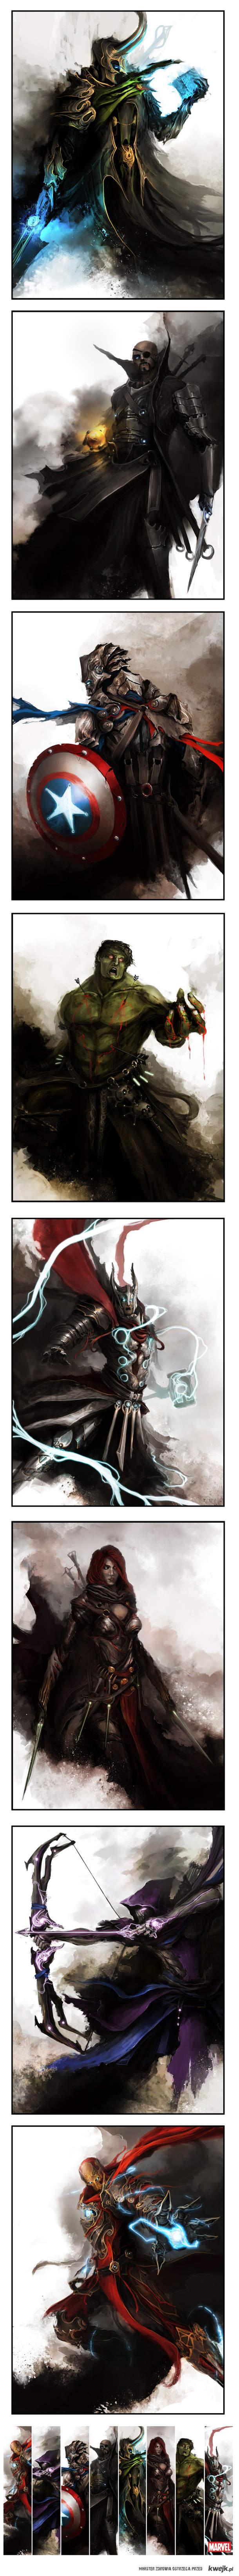 Epic Avengers